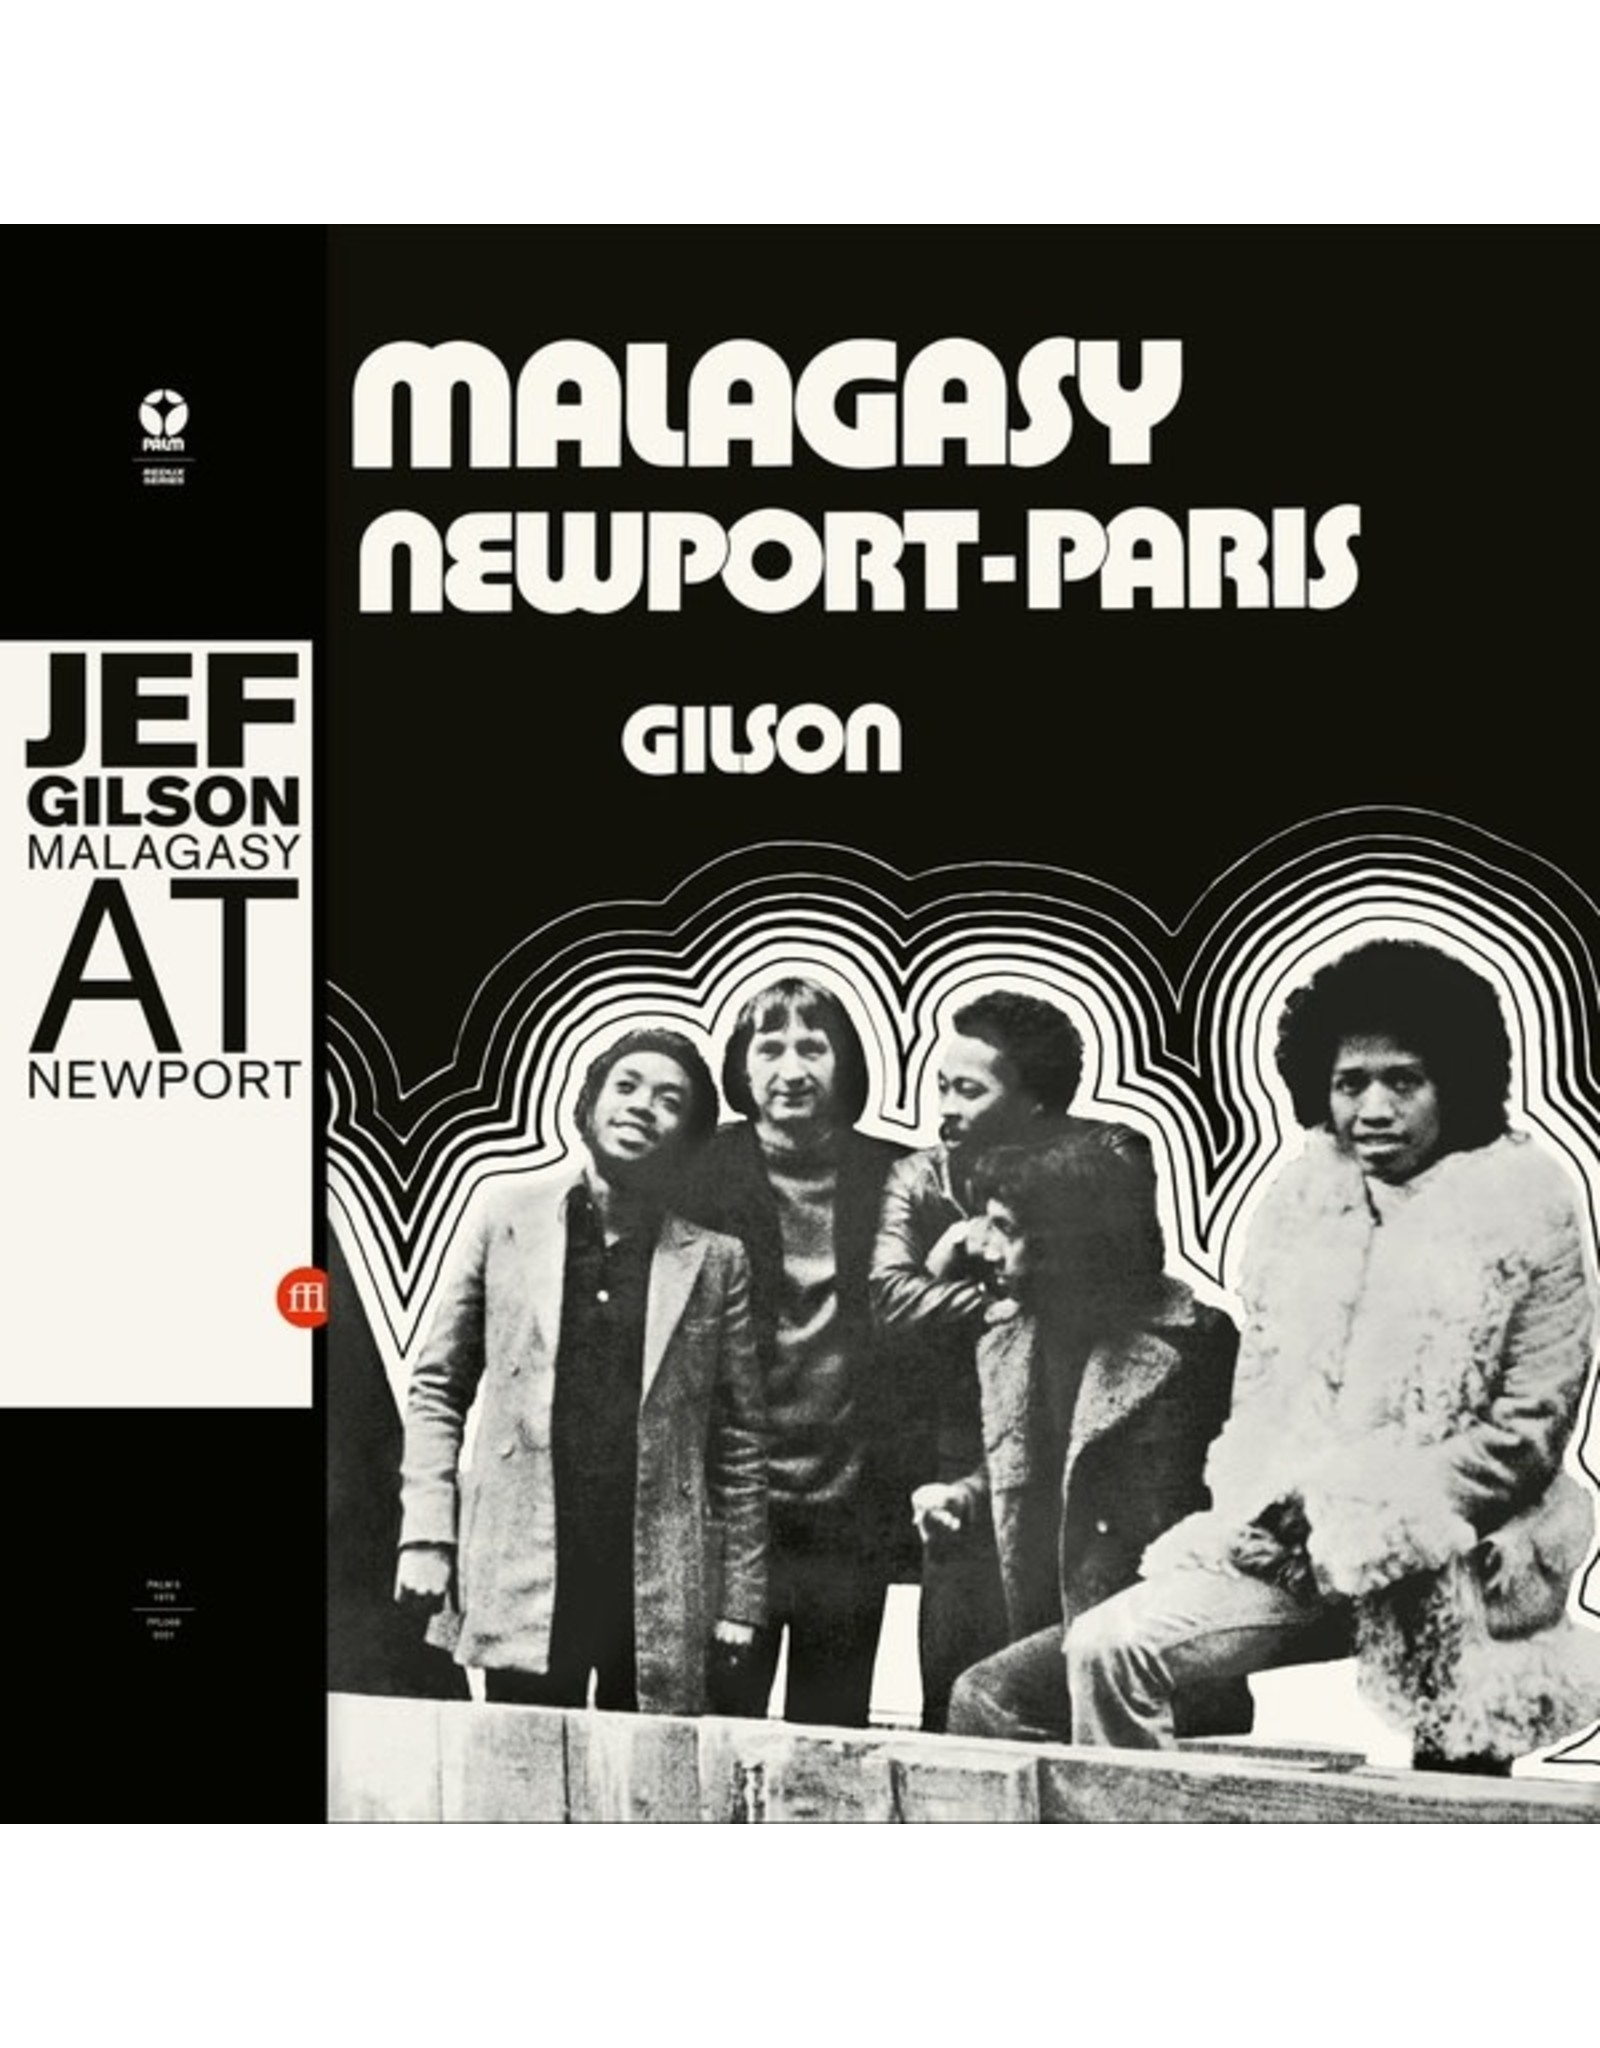 Souffle Continu Gilson, Jef: Malagasy At Newport-Paris LP